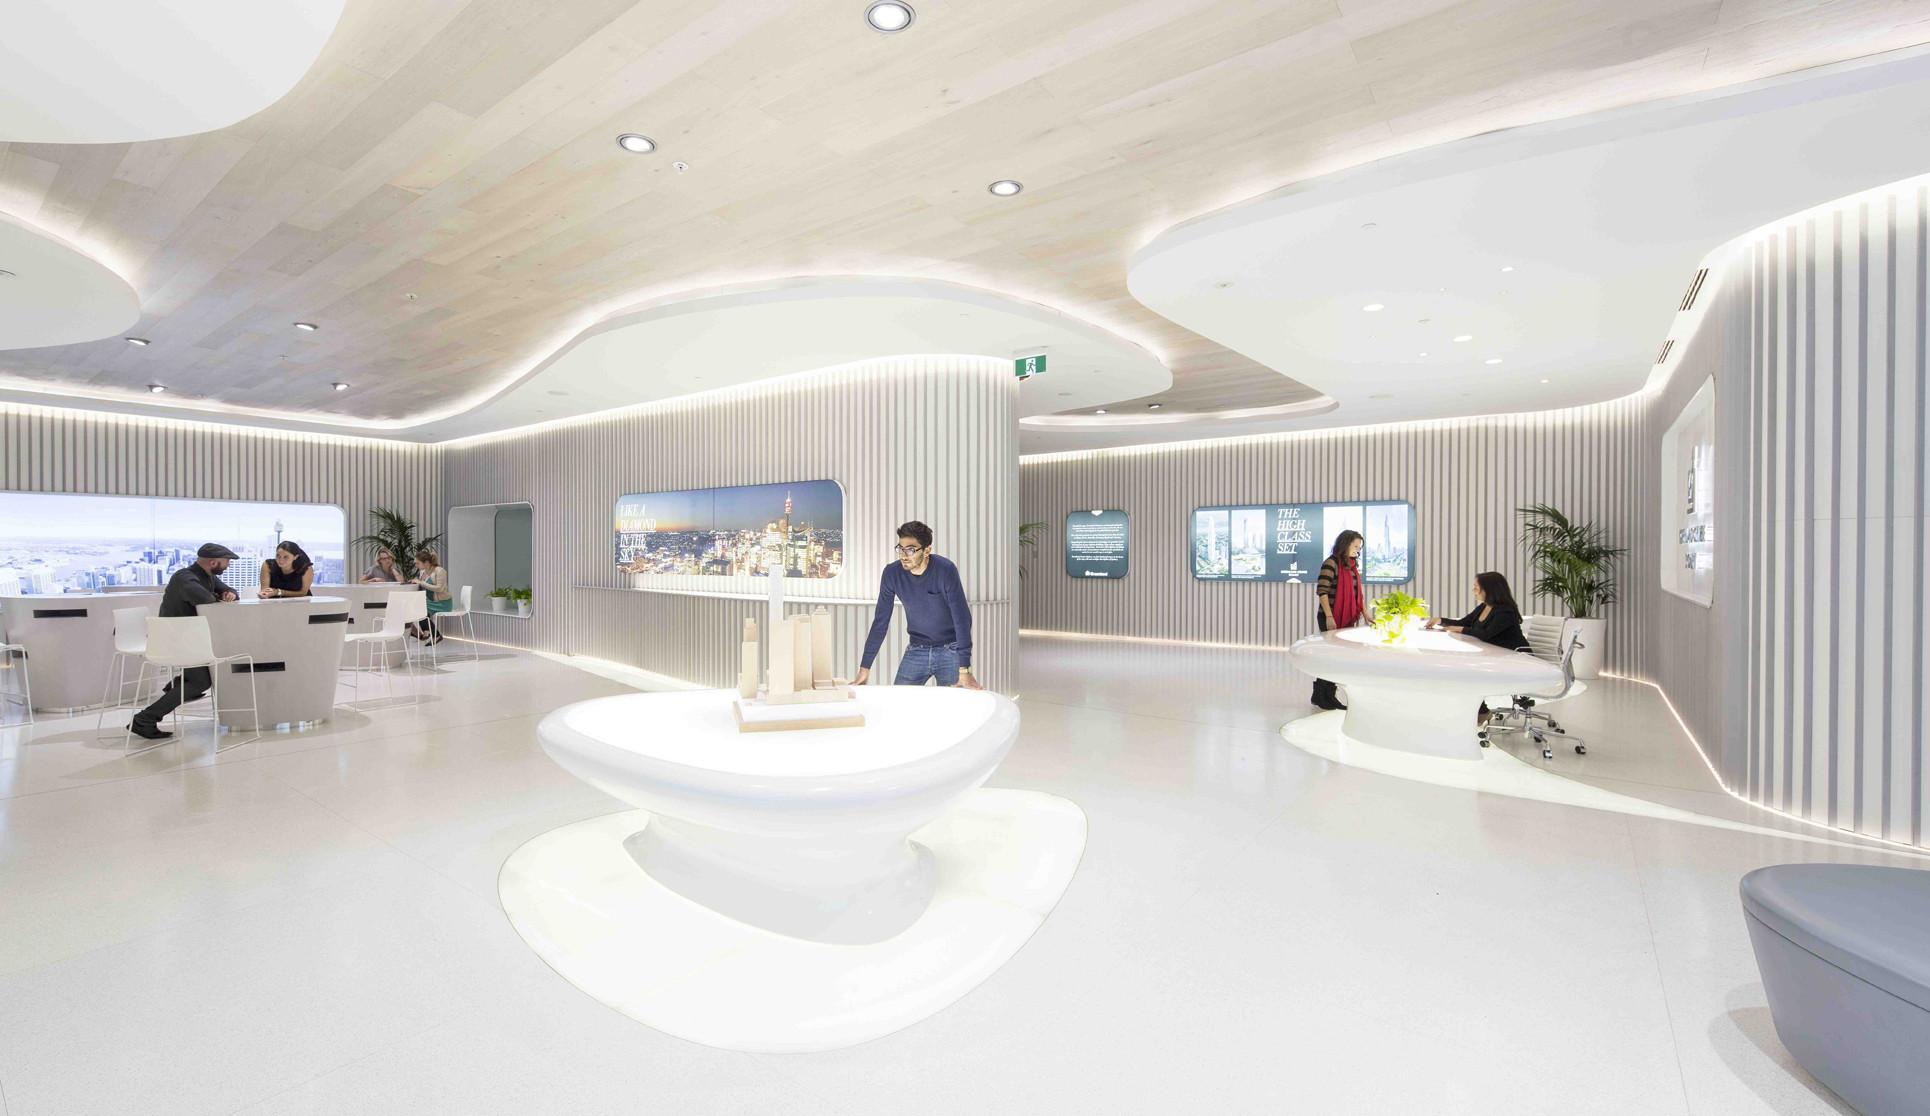 Sydney Greenland Centre Marketing Suite / PTW + LAVA, © Brett Boardman